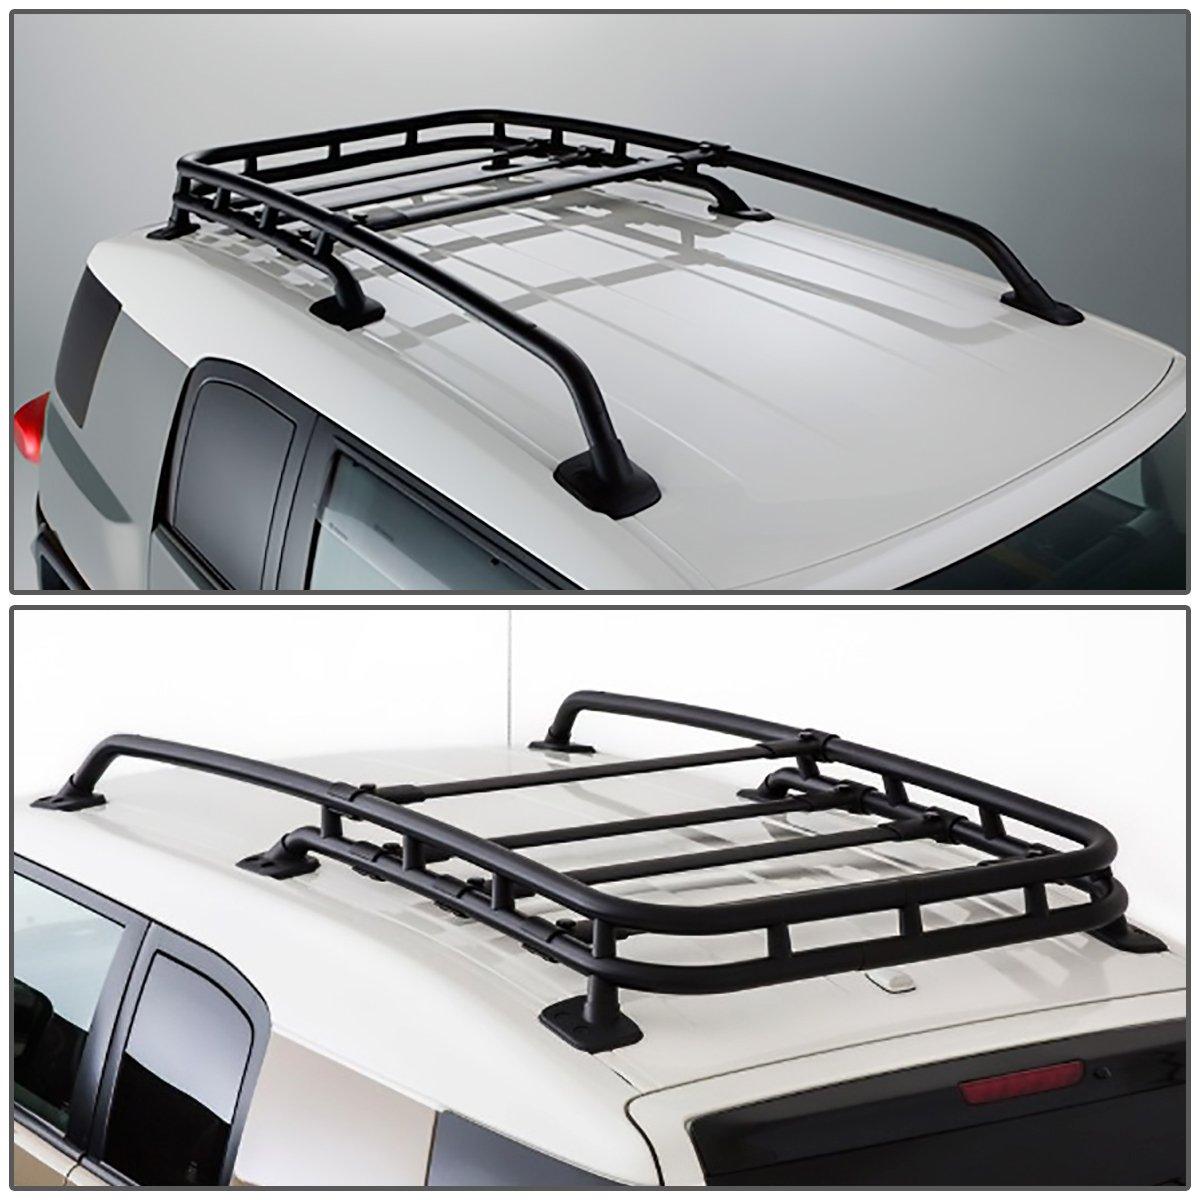 For FJ Cruiser Black-Coated Aluminum Roof Rack Rail Top Cargo Luggage Carrier